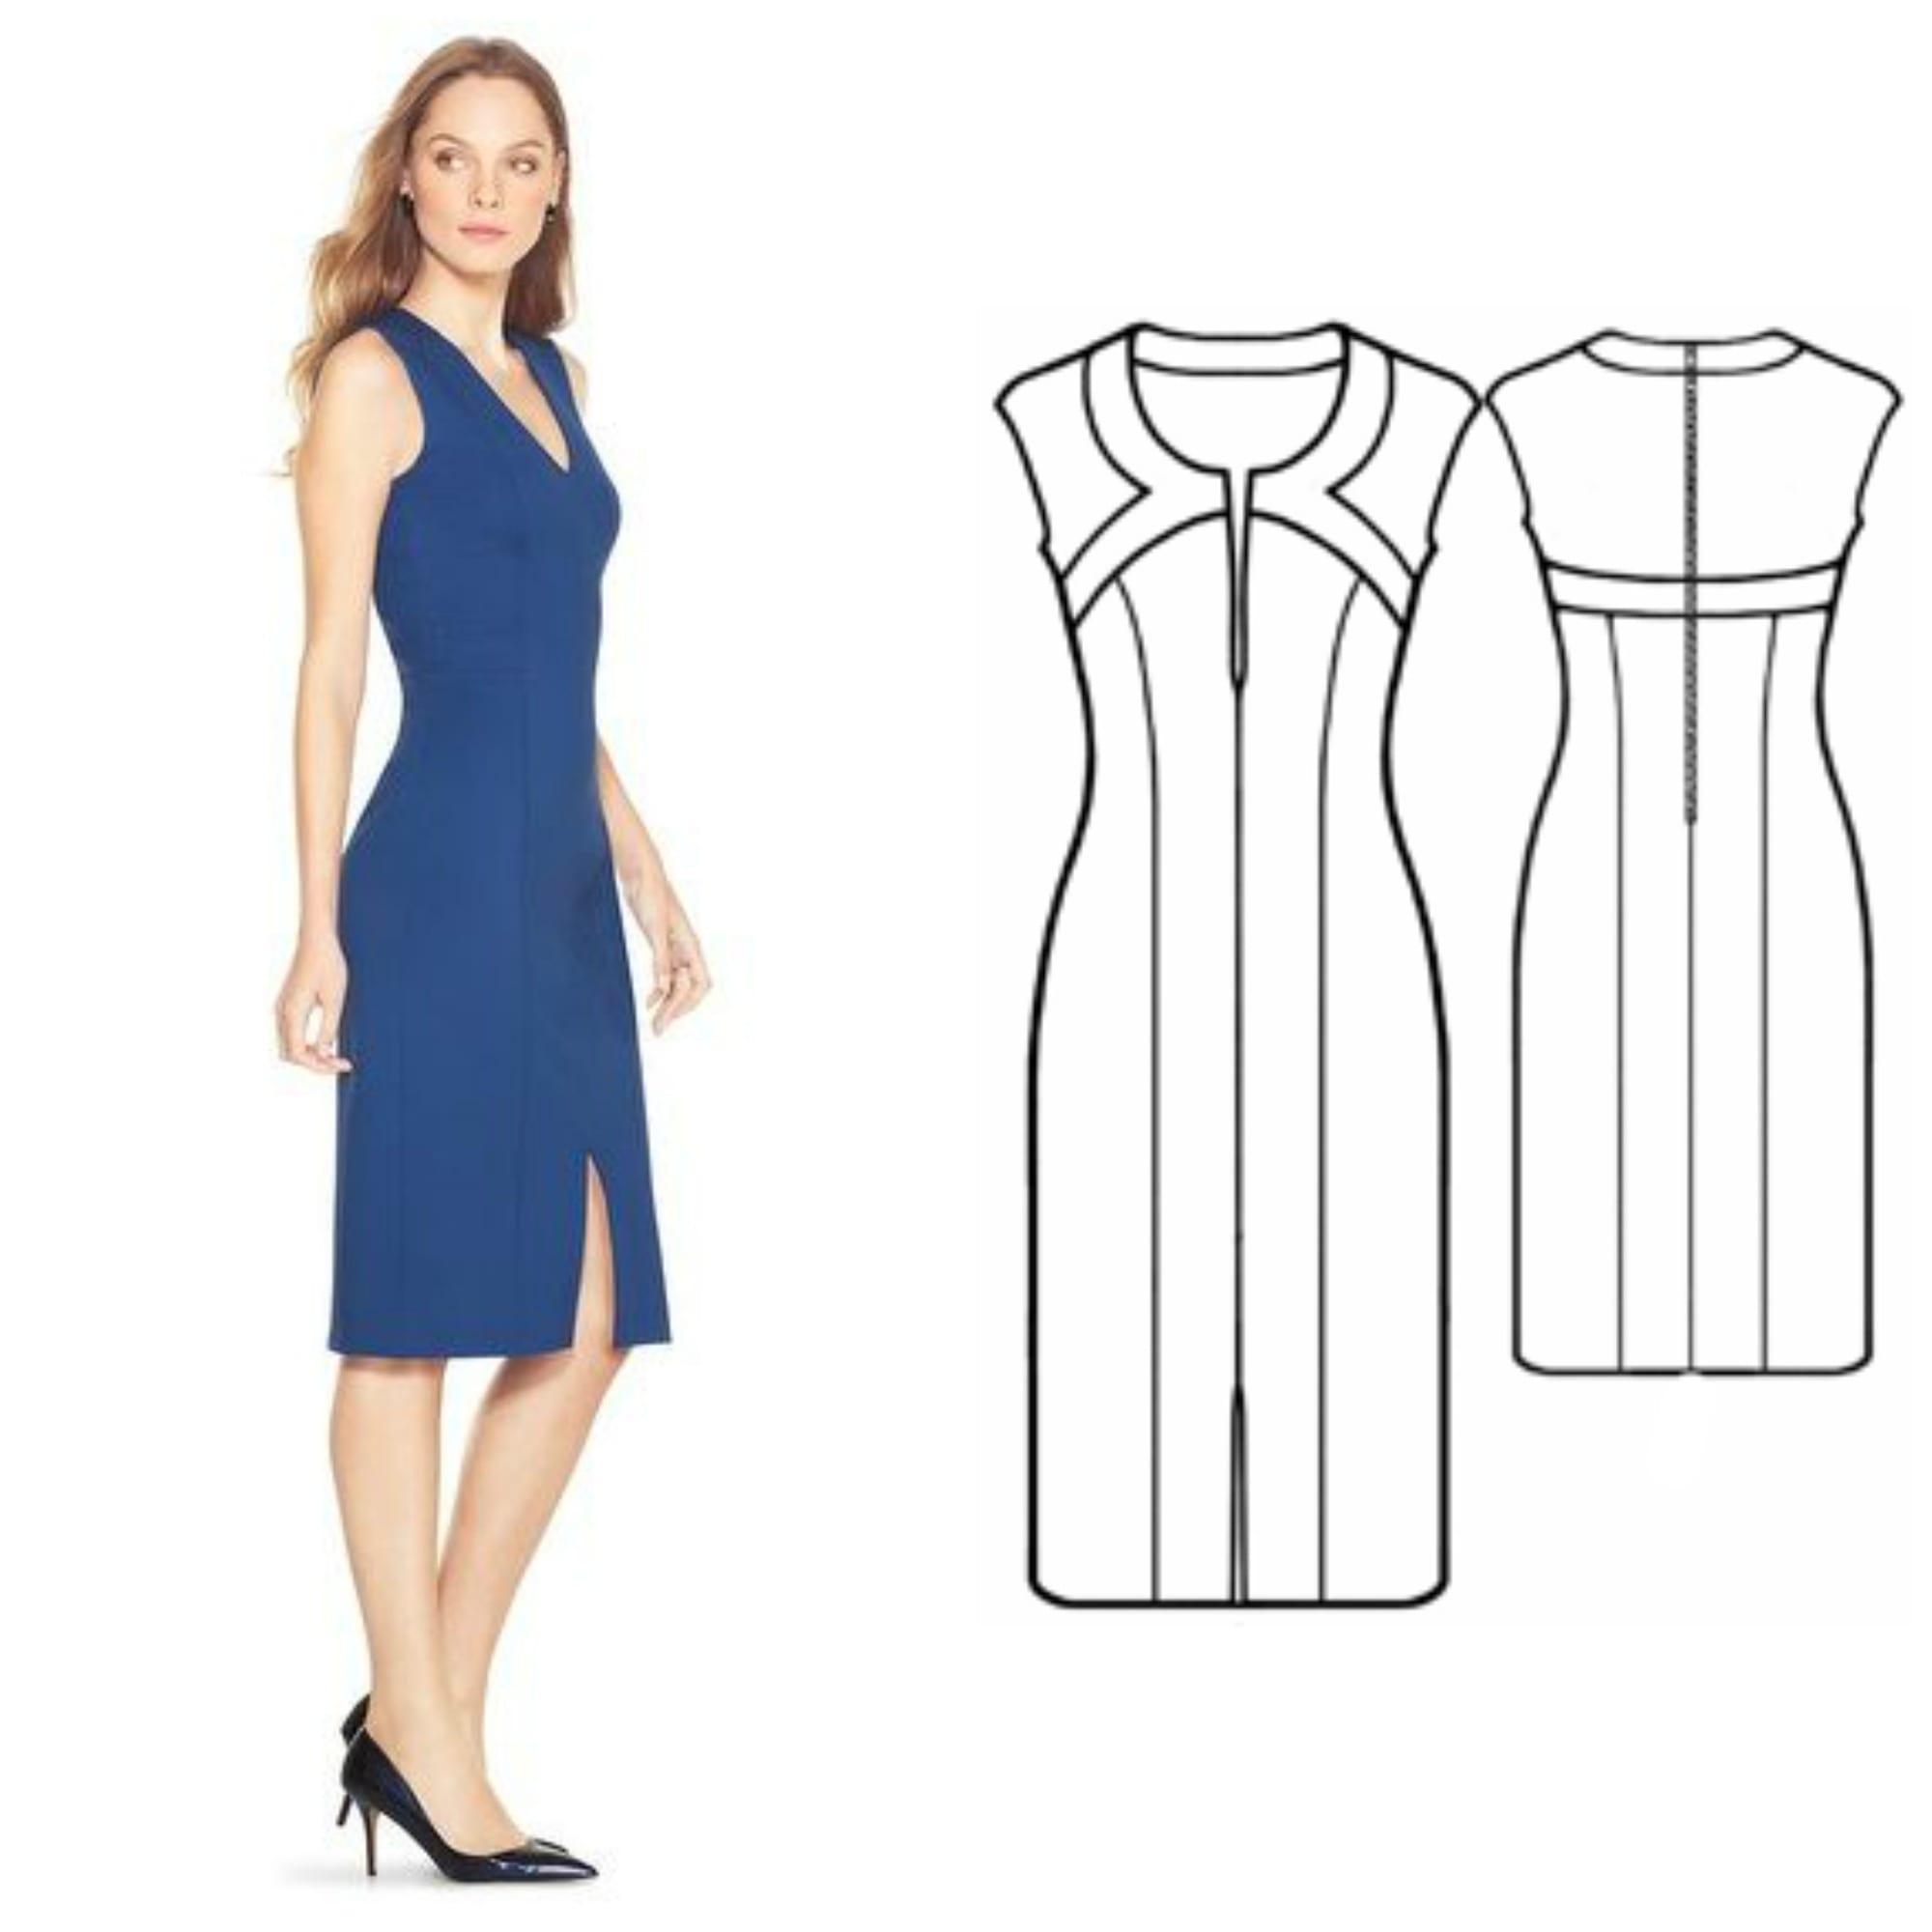 Free Dress Patterns: Shaped Trim Dress